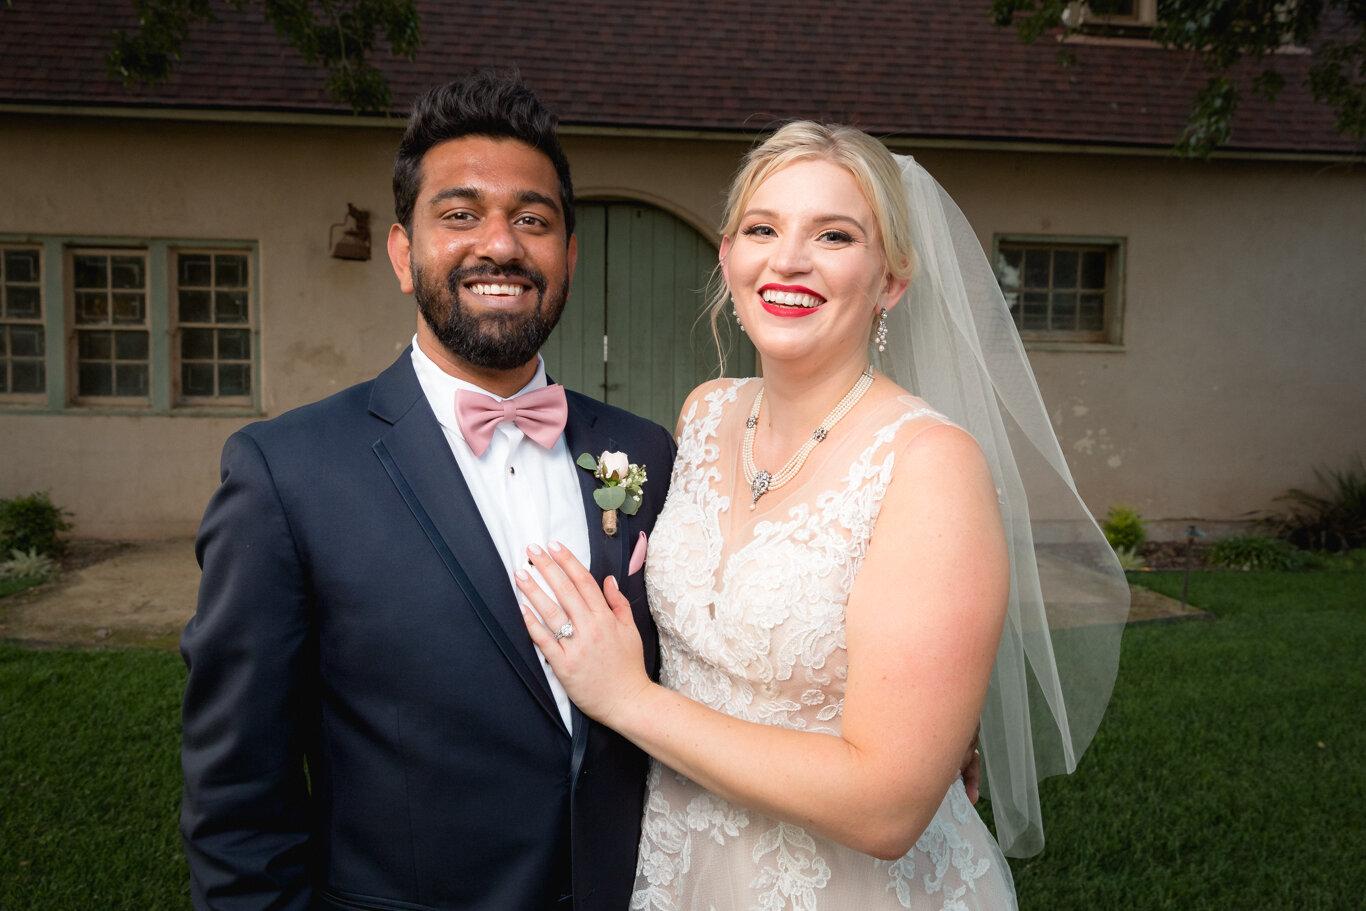 2019.08.24_Emily-Ashir-Wedding-at-the-Maples-6260.jpg